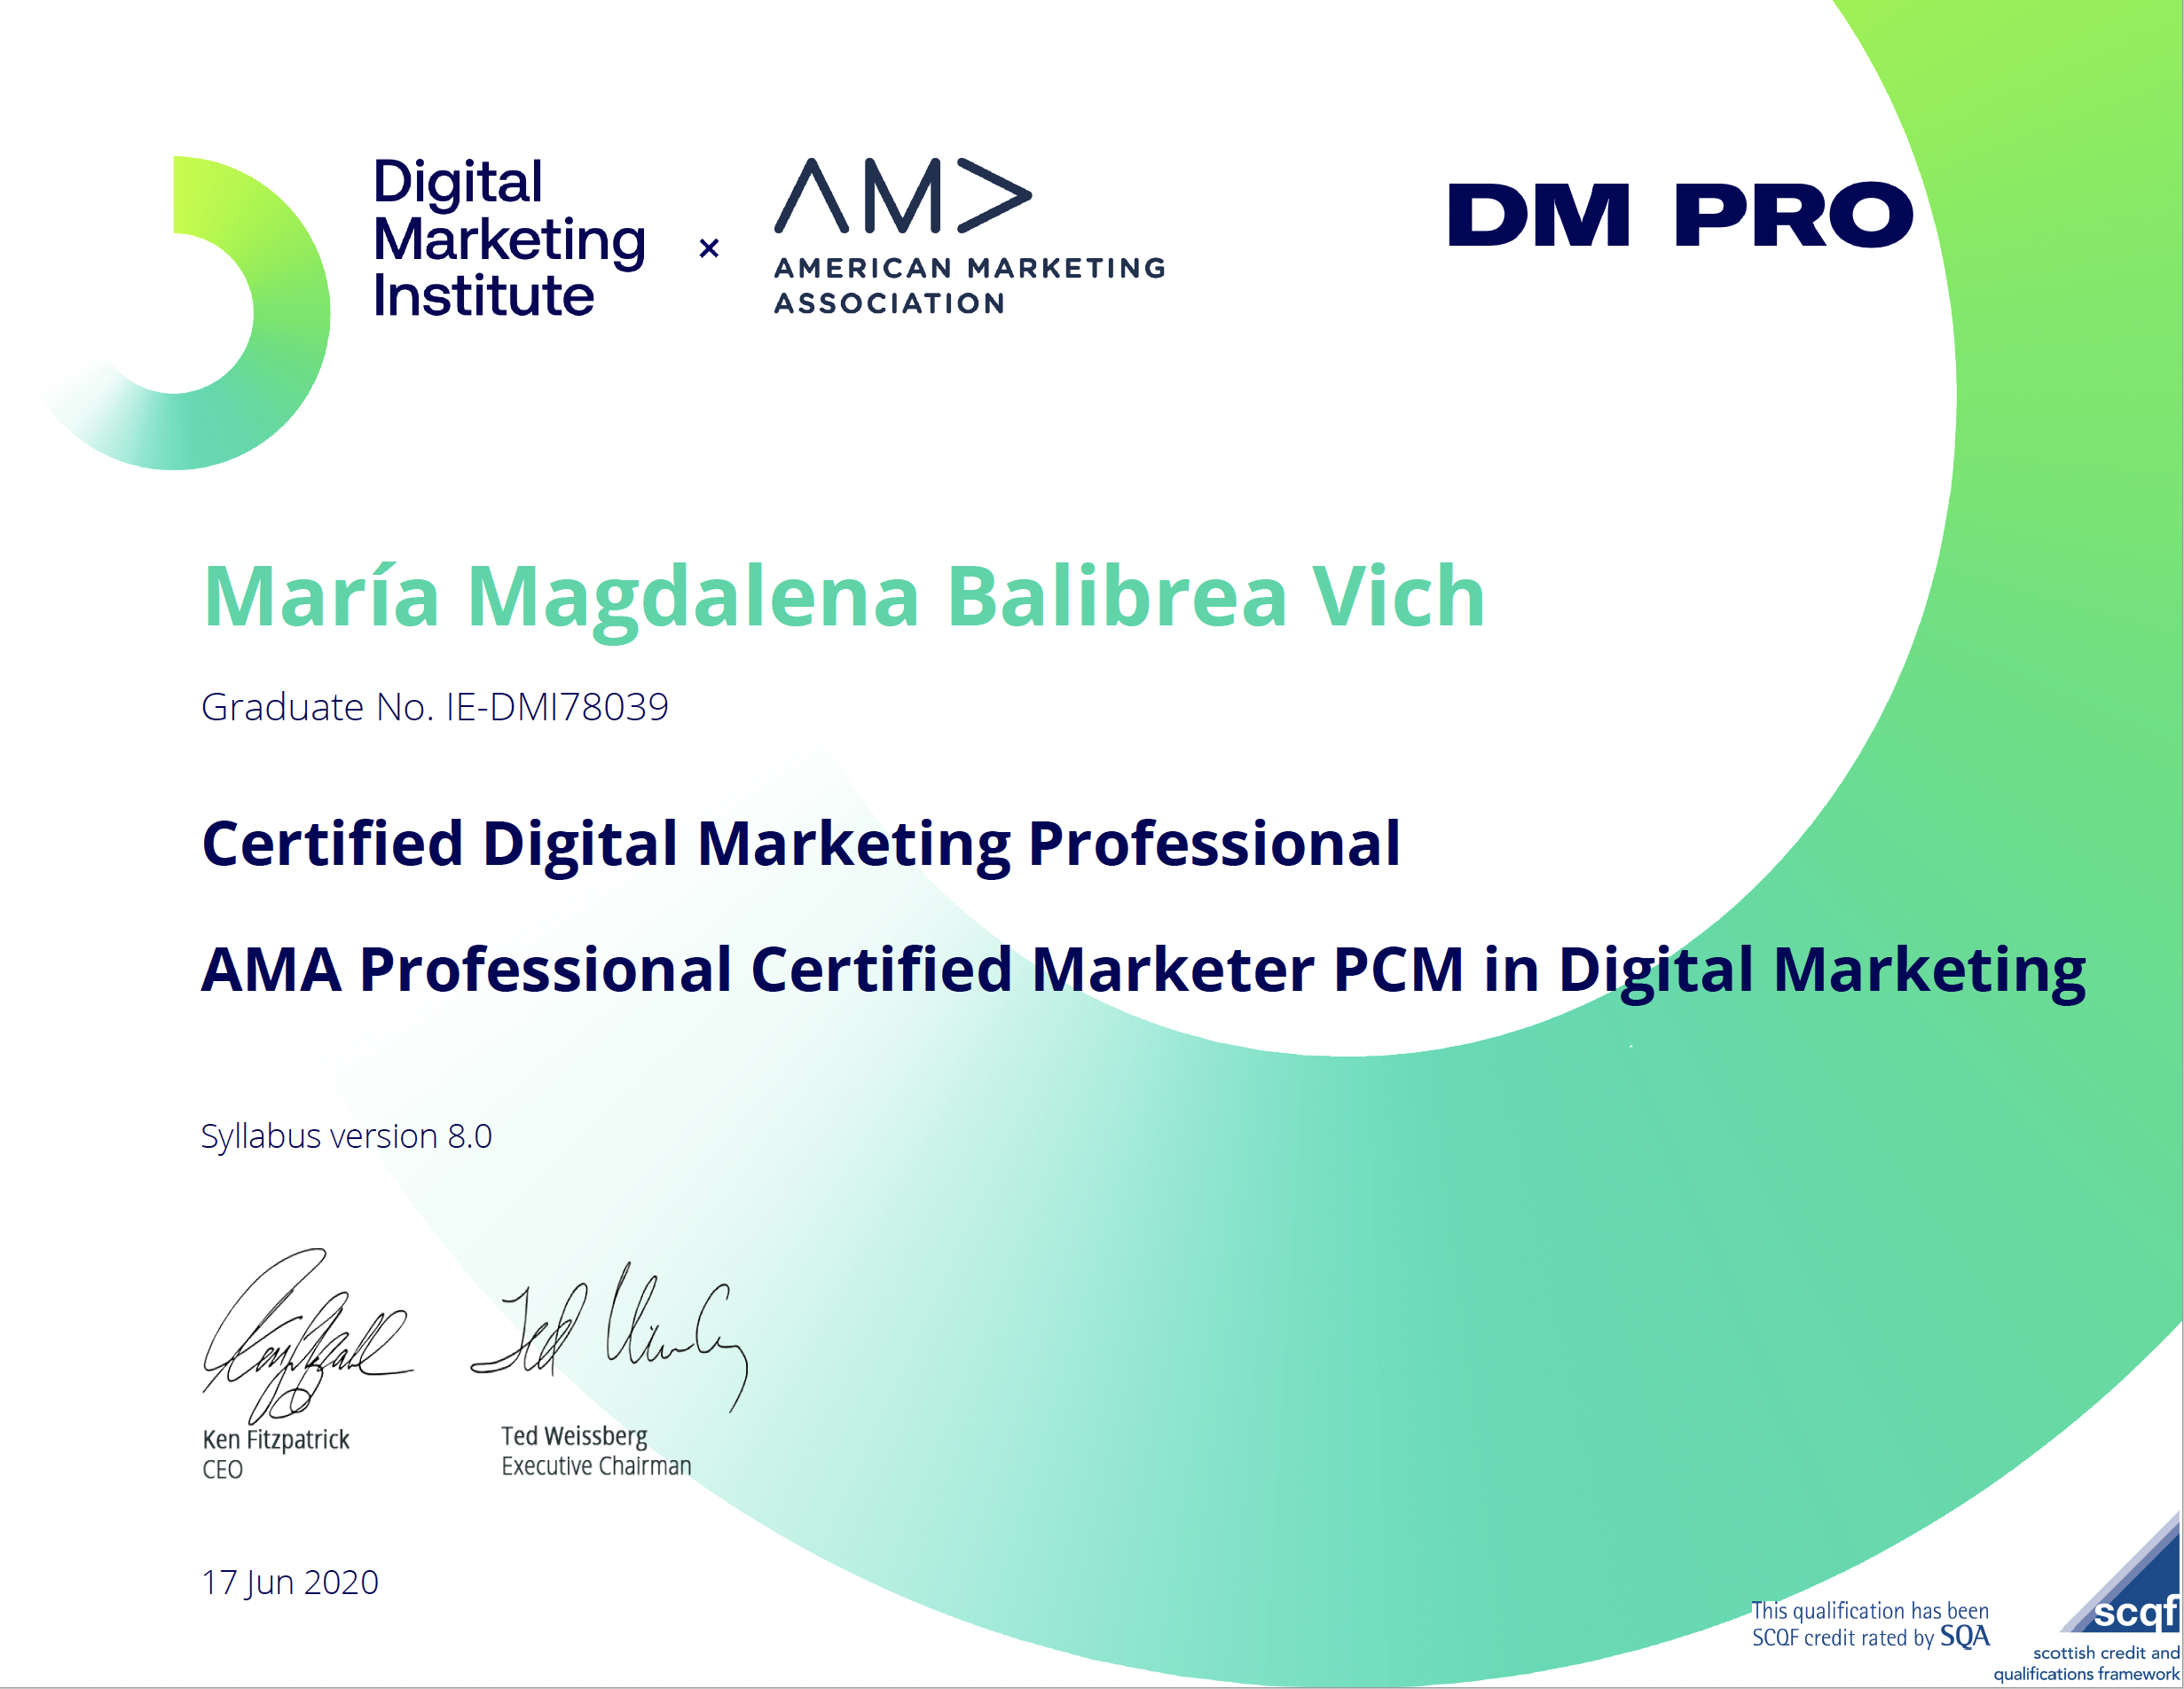 Certified DM Pro - Digital Marketing Institute